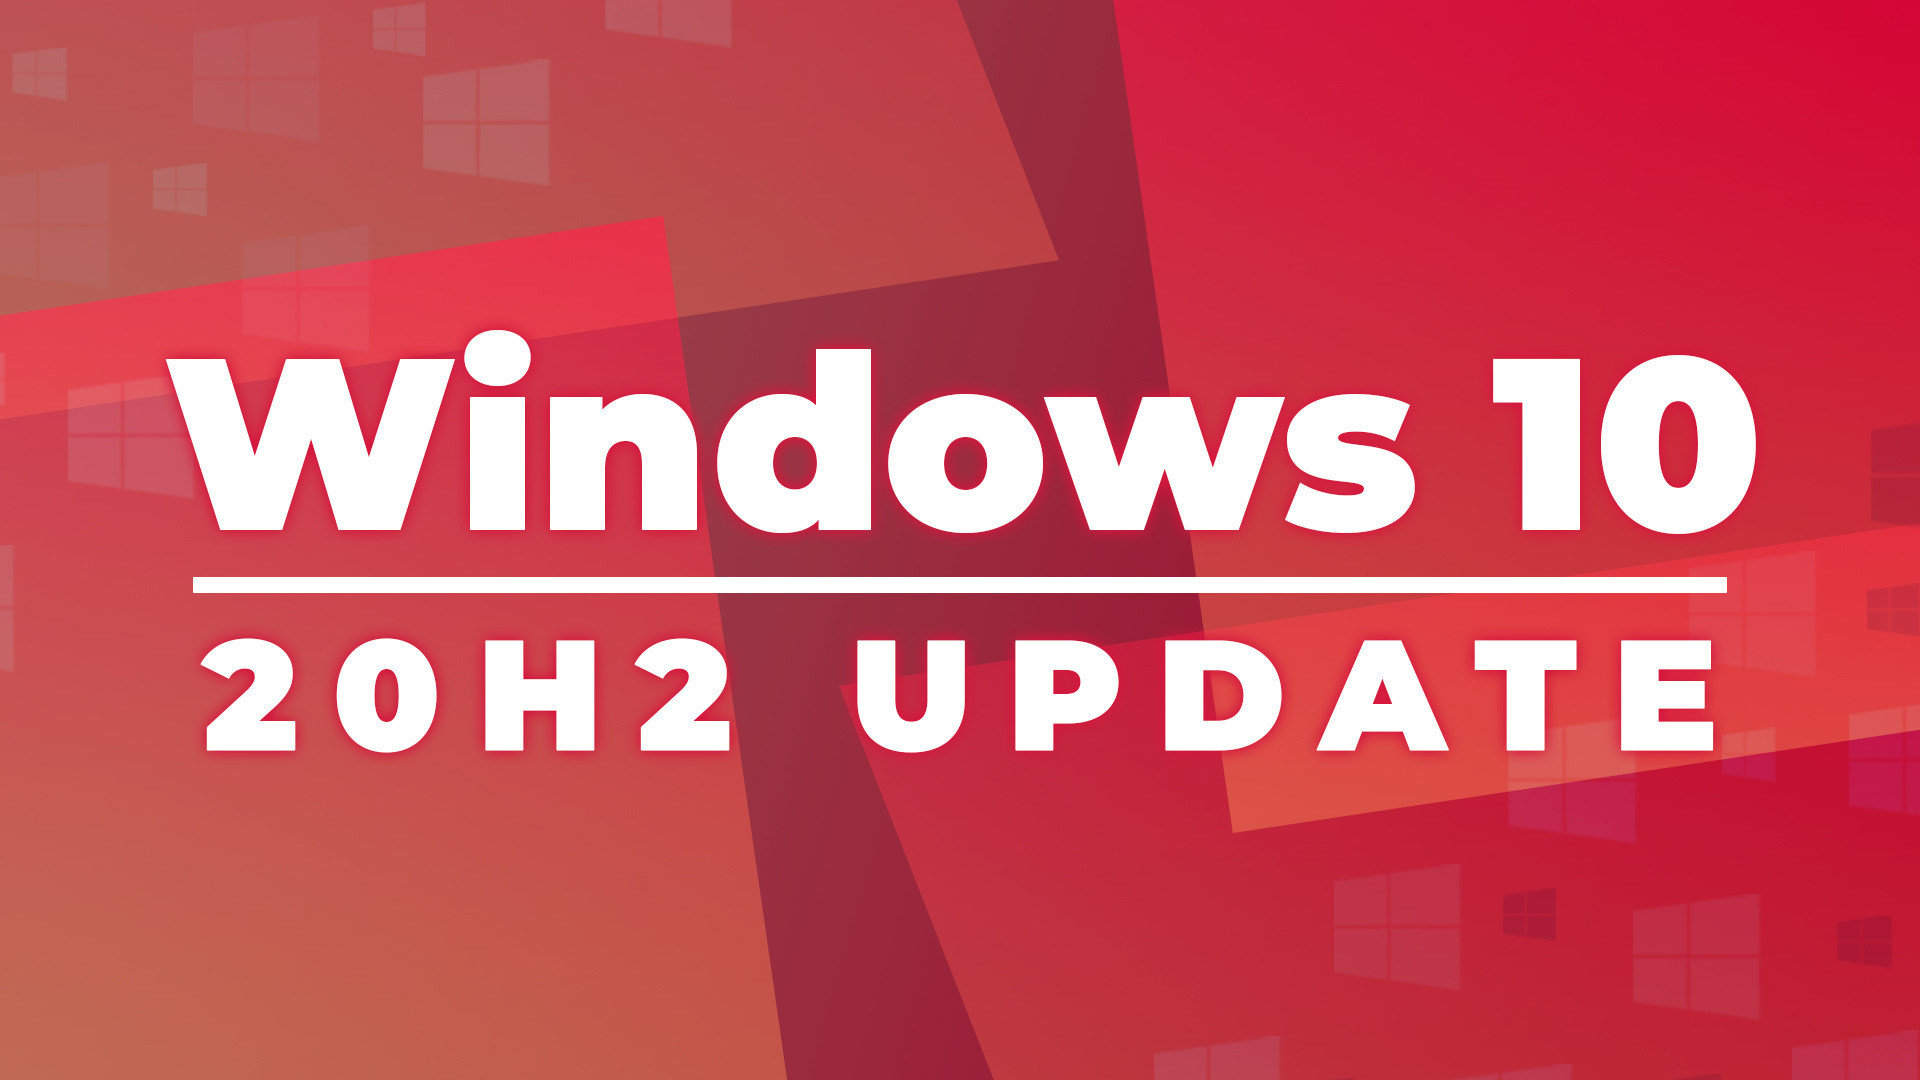 Microsoft, Betriebssystem, Windows 10, Update, 20h2, Windows 10 Oktober Update, Windows 10 Update, Windows 10 Herbst Update, Herbst, Windows 10 20H2, Windows 10 Fall Update, Herbst Update, Windows 10 20H2 Update, Windows 10 Oktober 2020 Update, Windows 10 Oktober 2020